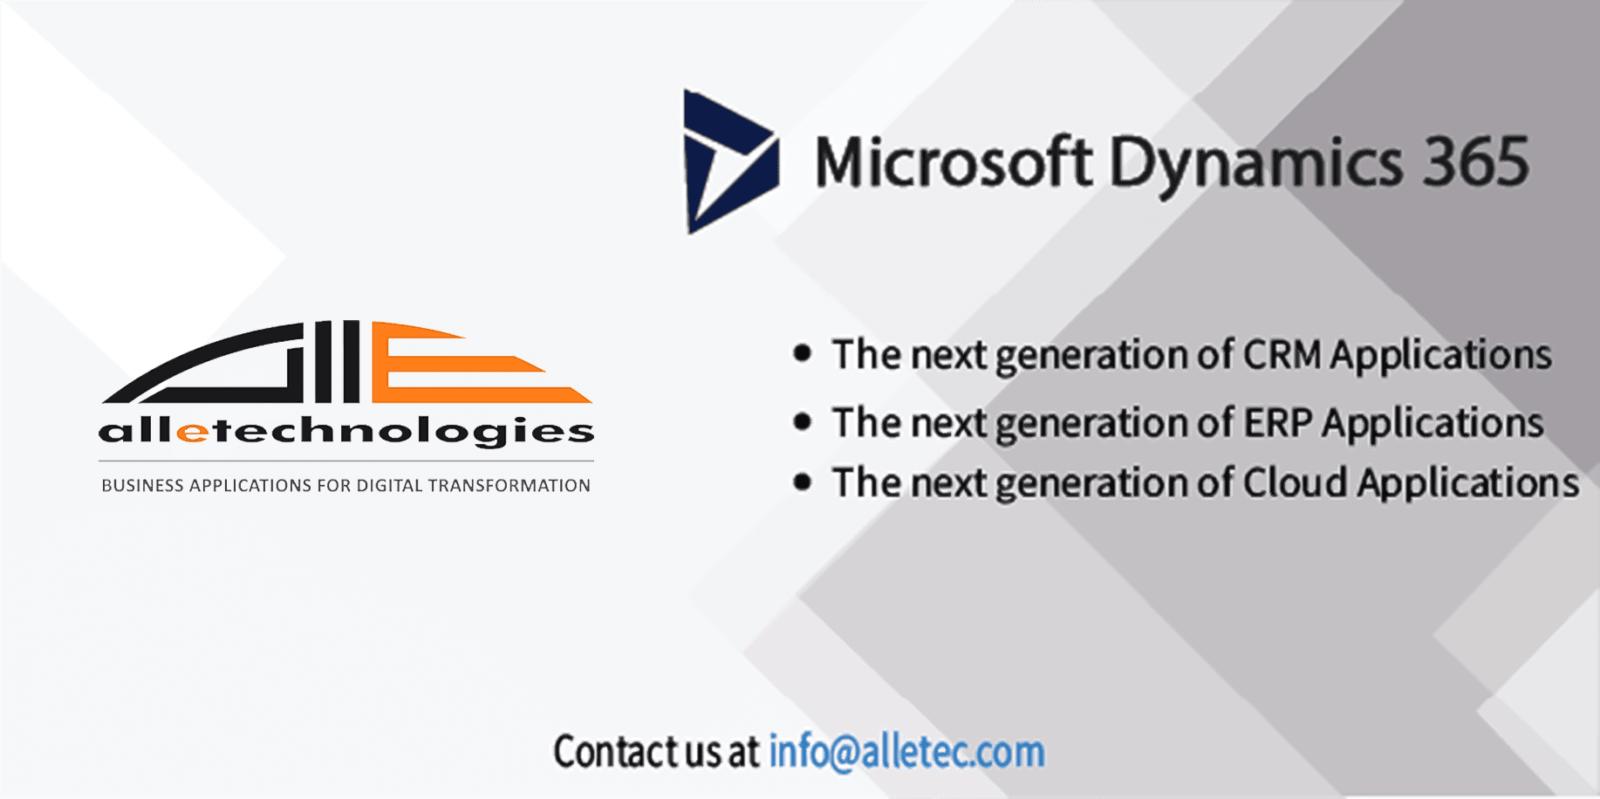 Microsoft Dynamics 365 Info Banner - Microsoft Dynamics 365 Info Banner